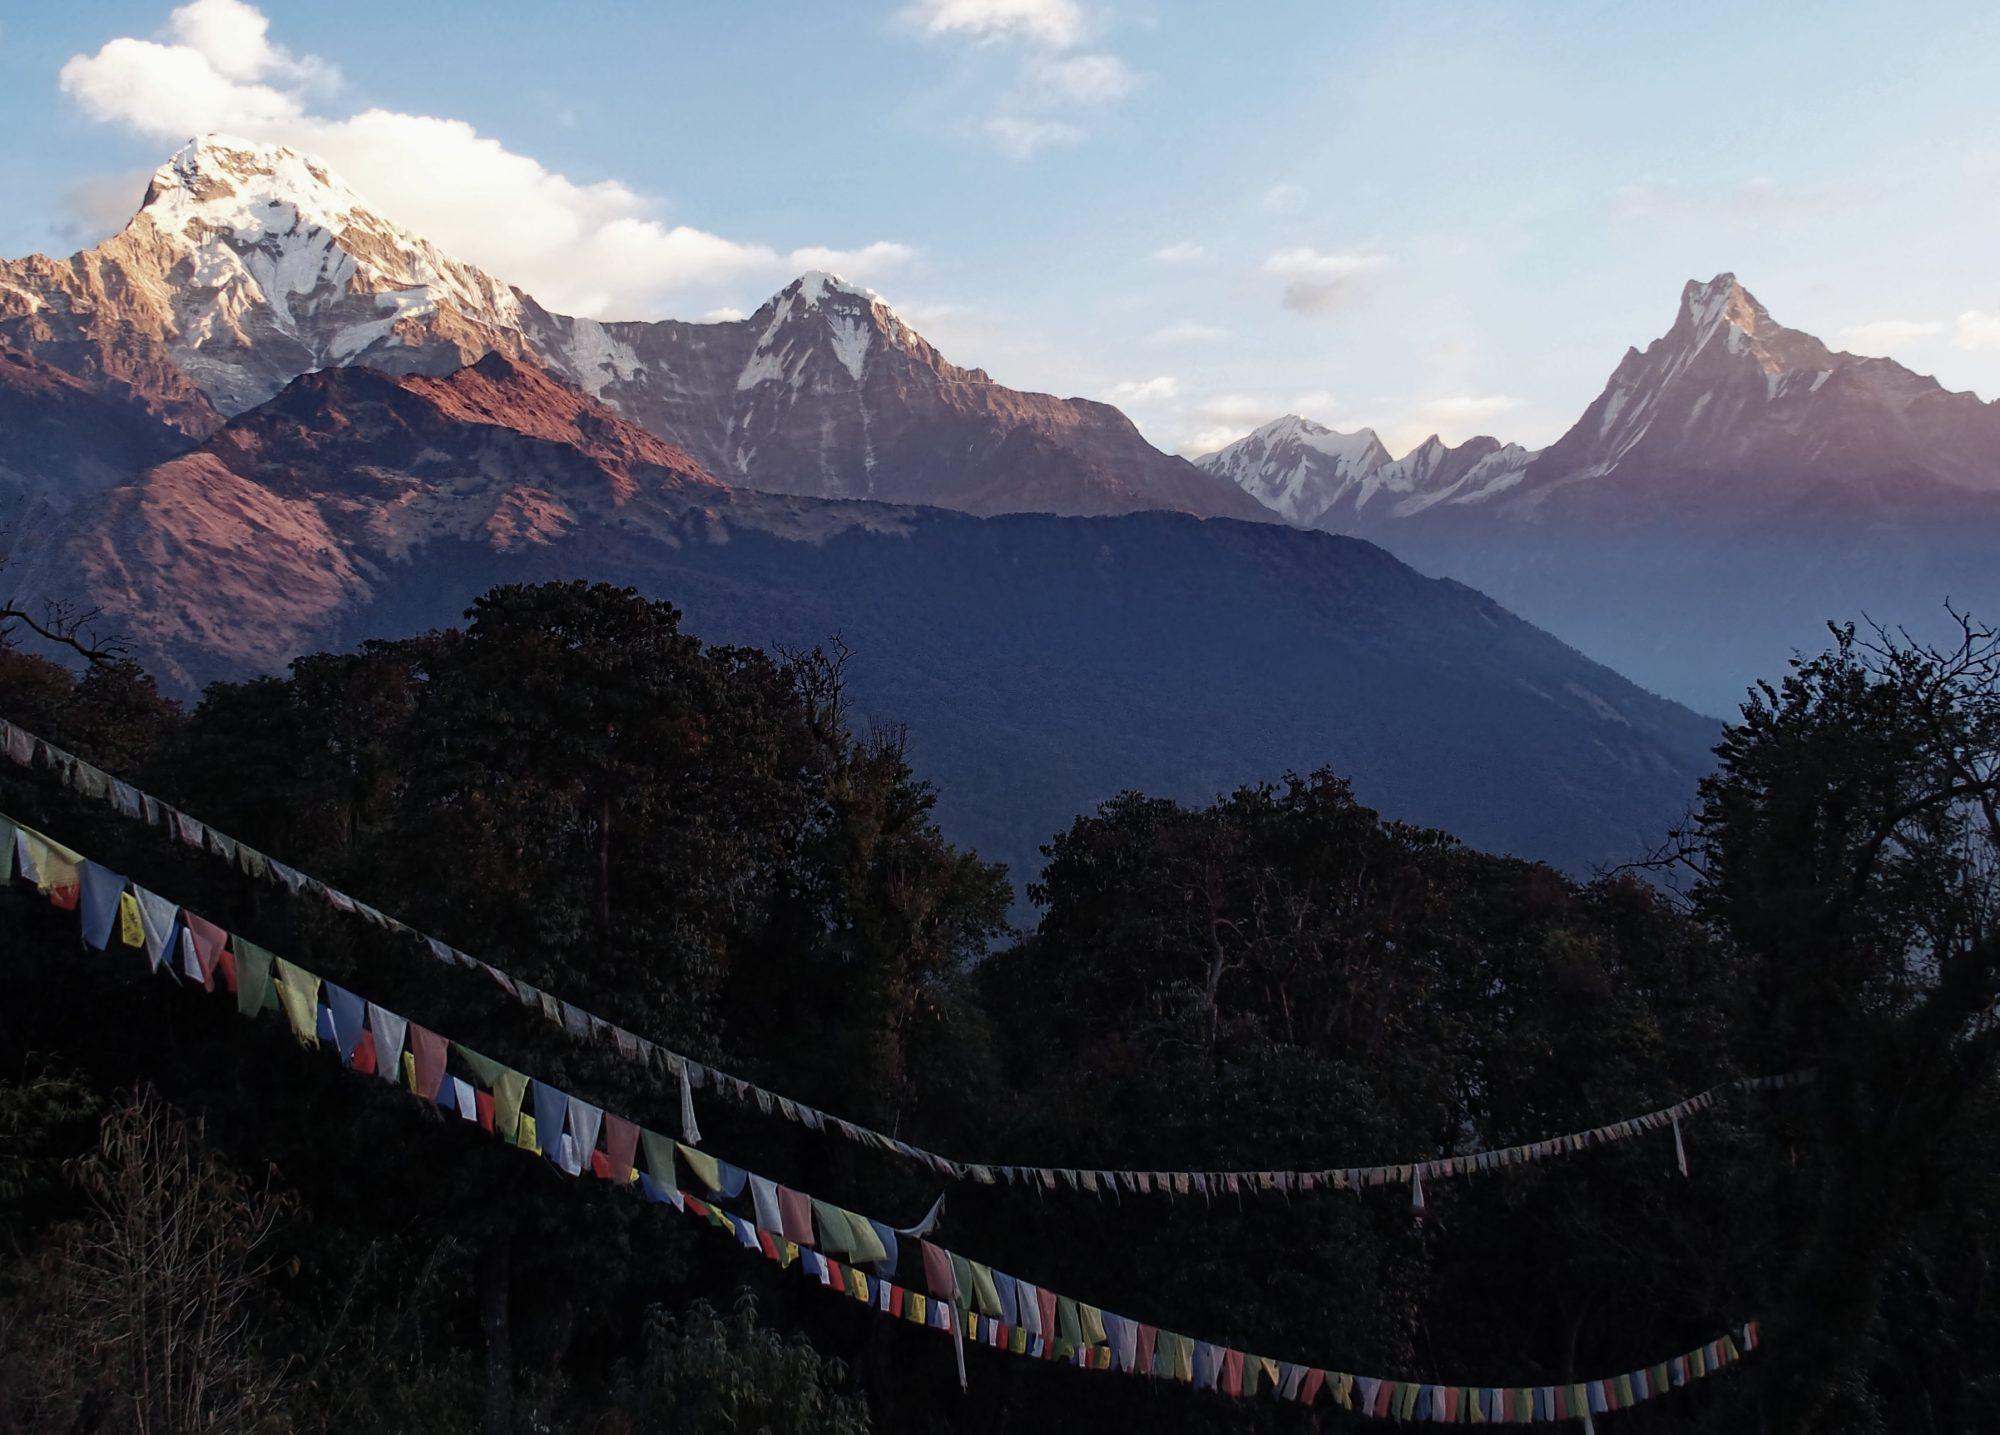 Sonnenaufgang Tadapani. Nepal. Buddhistische Flaggen.